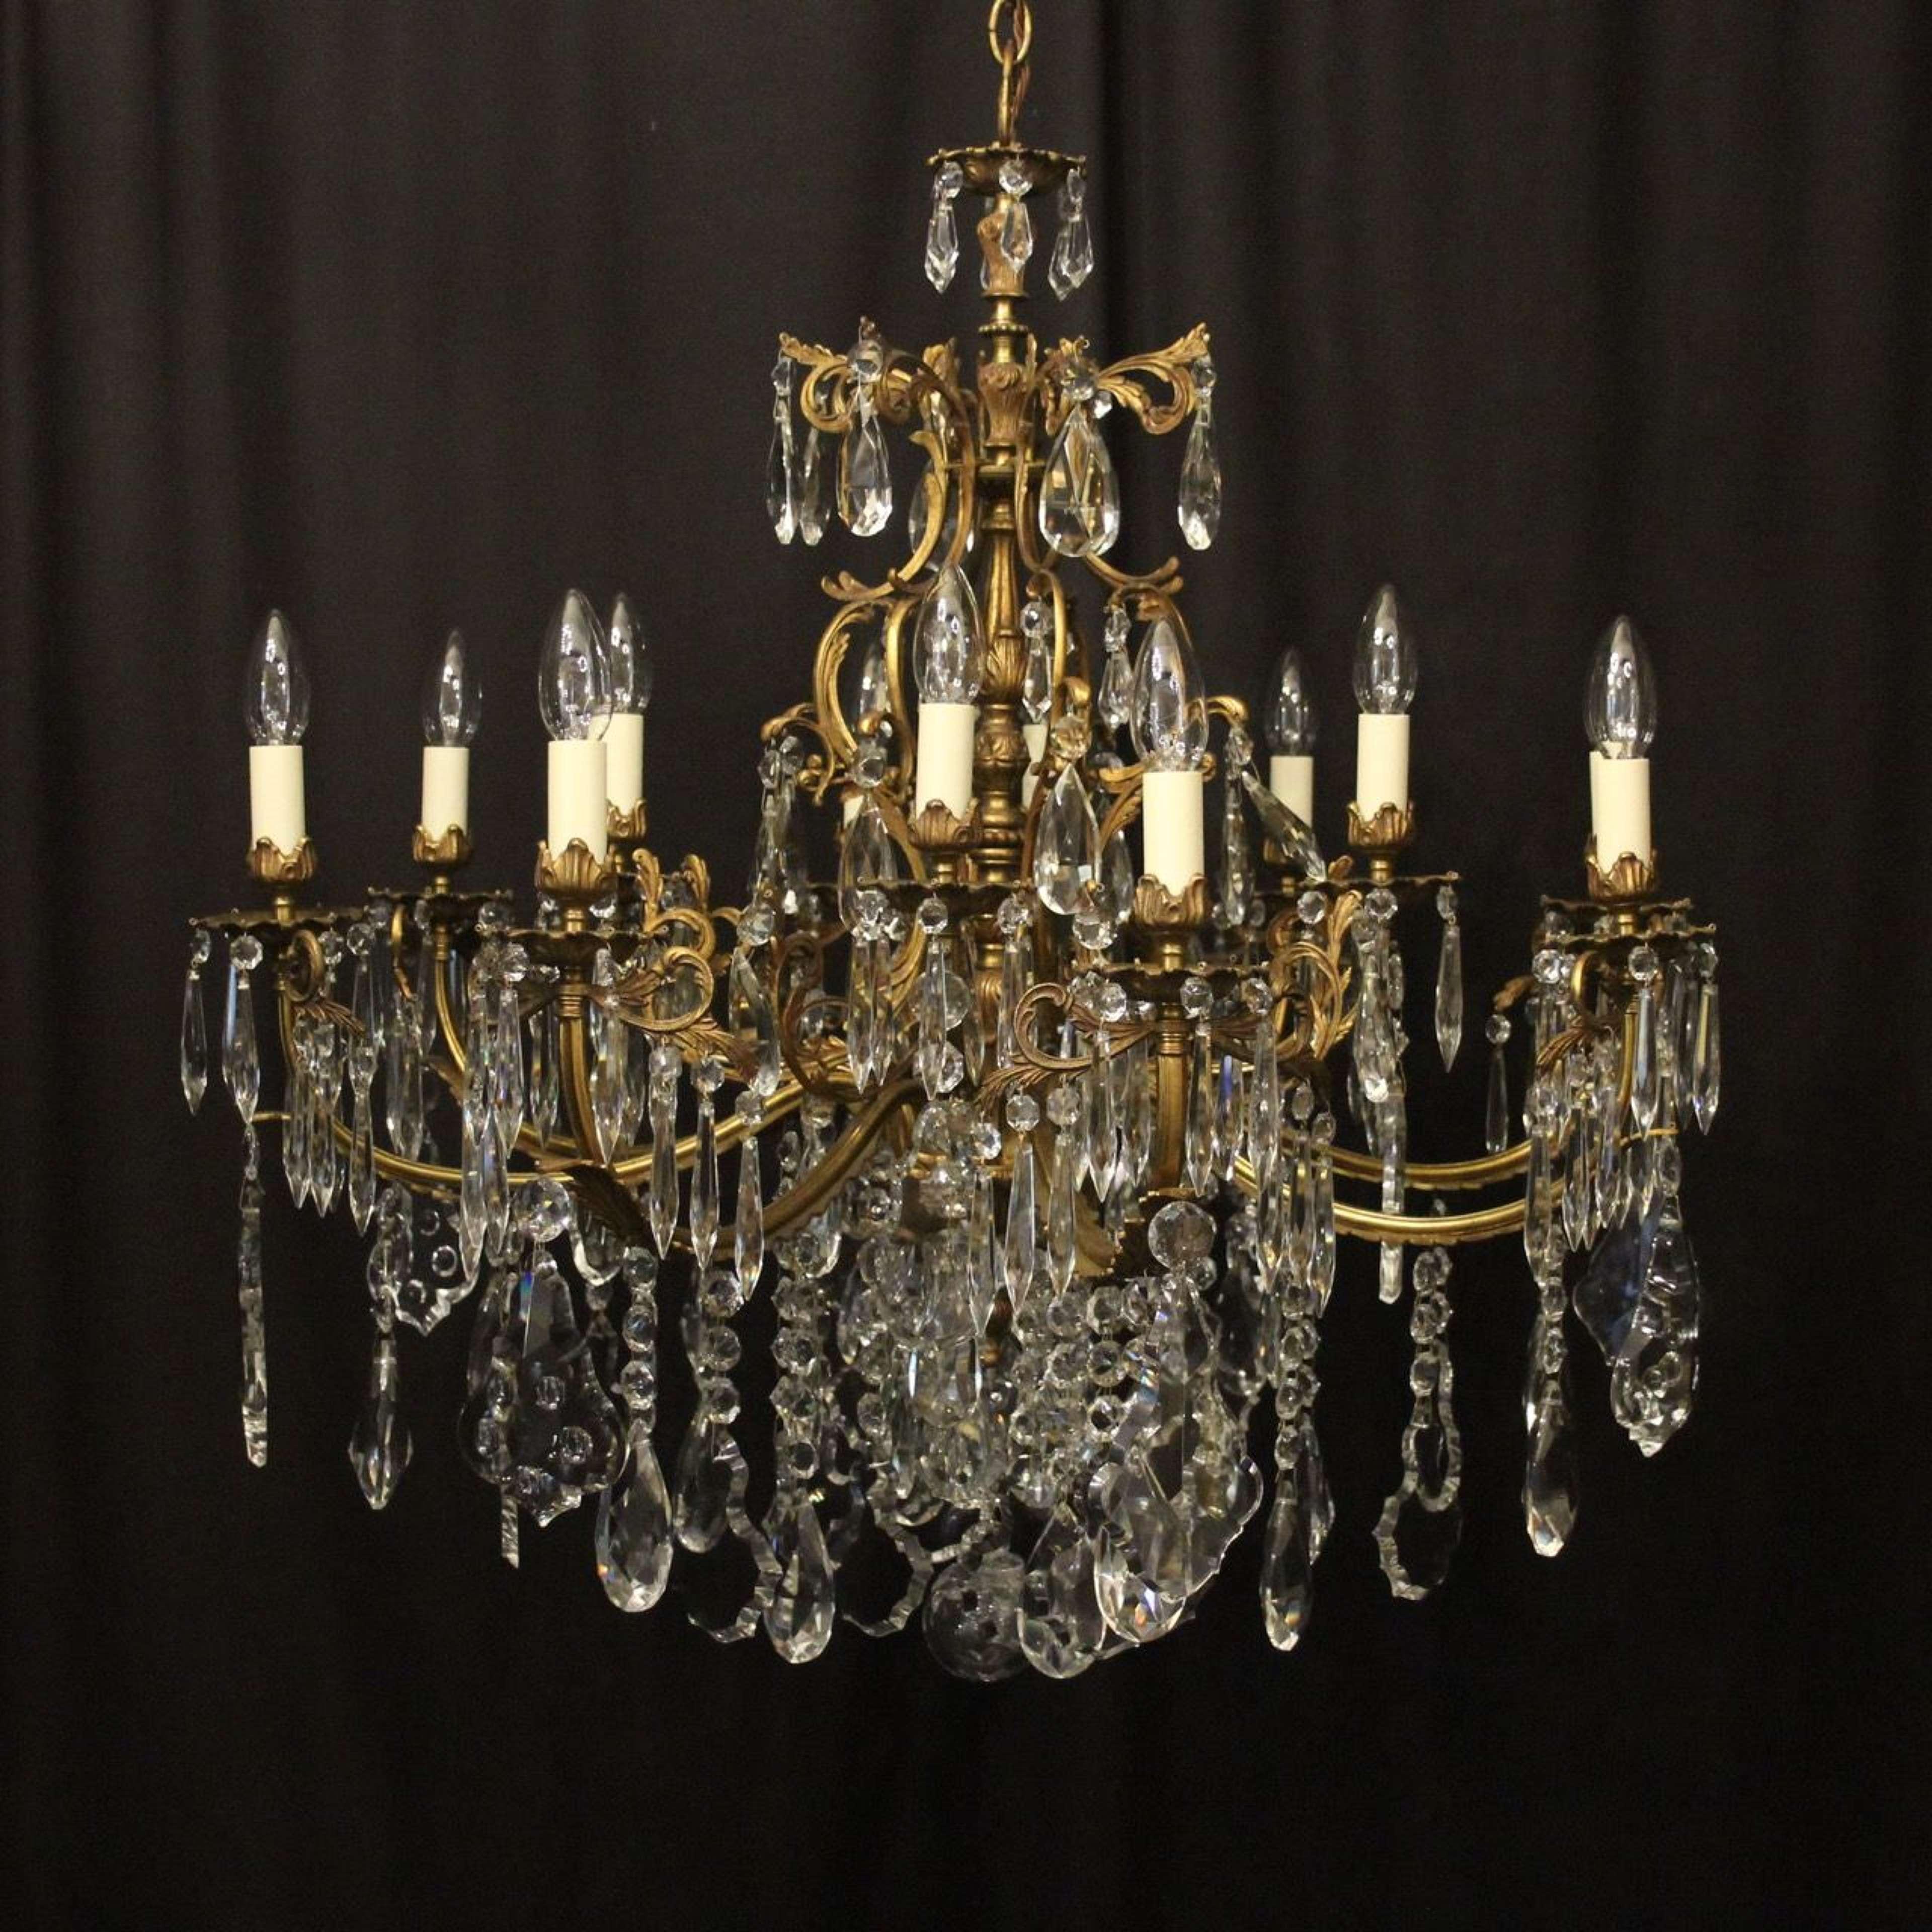 French 12 Light Gilded Bronze Antique Chandelier